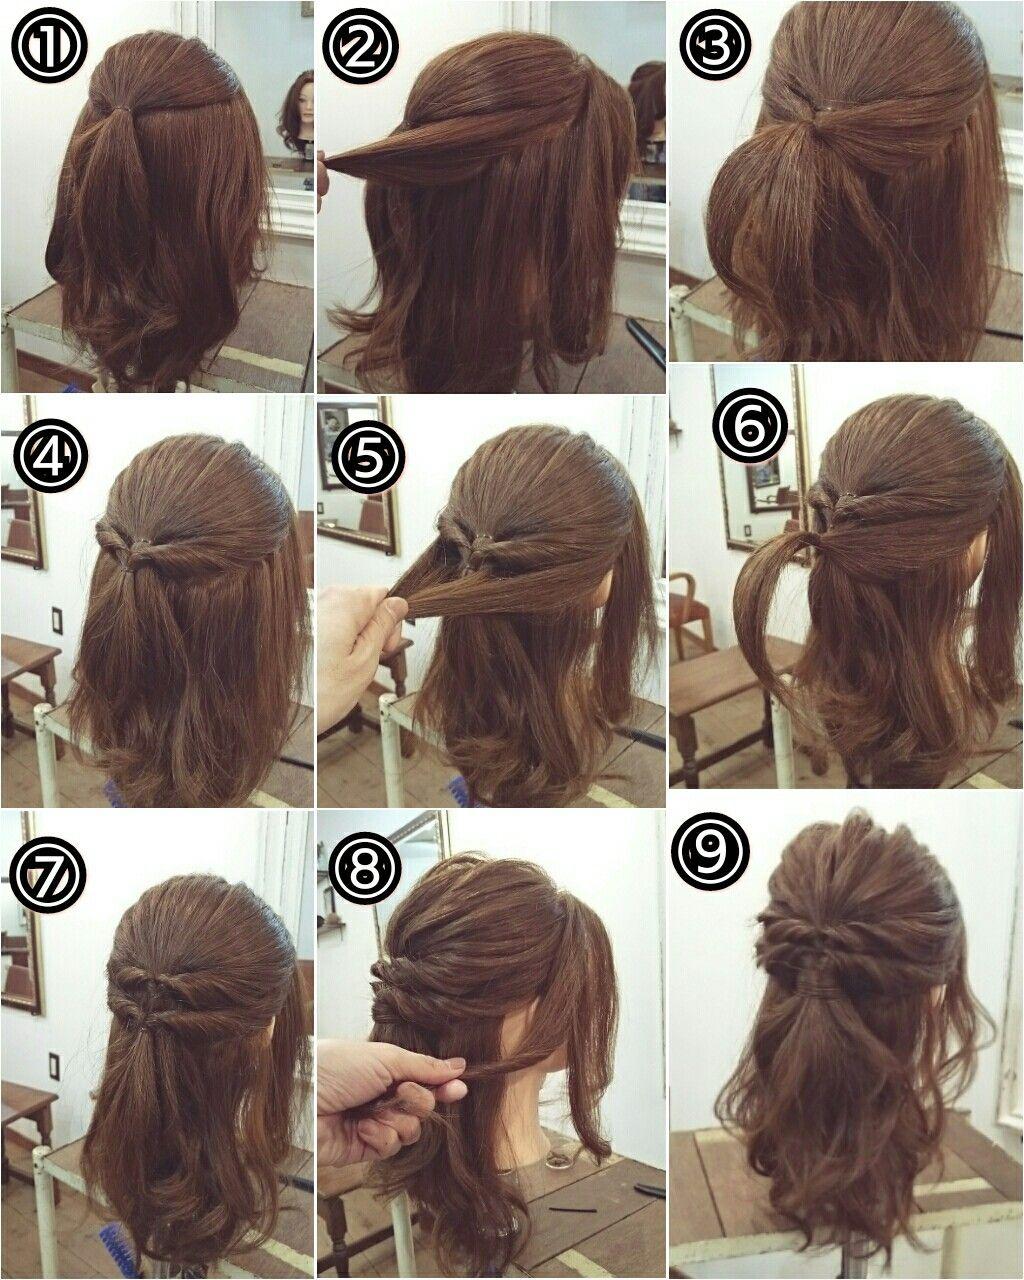 Pin by ซากนะ เอเดย on ผมเปย pinterest hair style easy hair